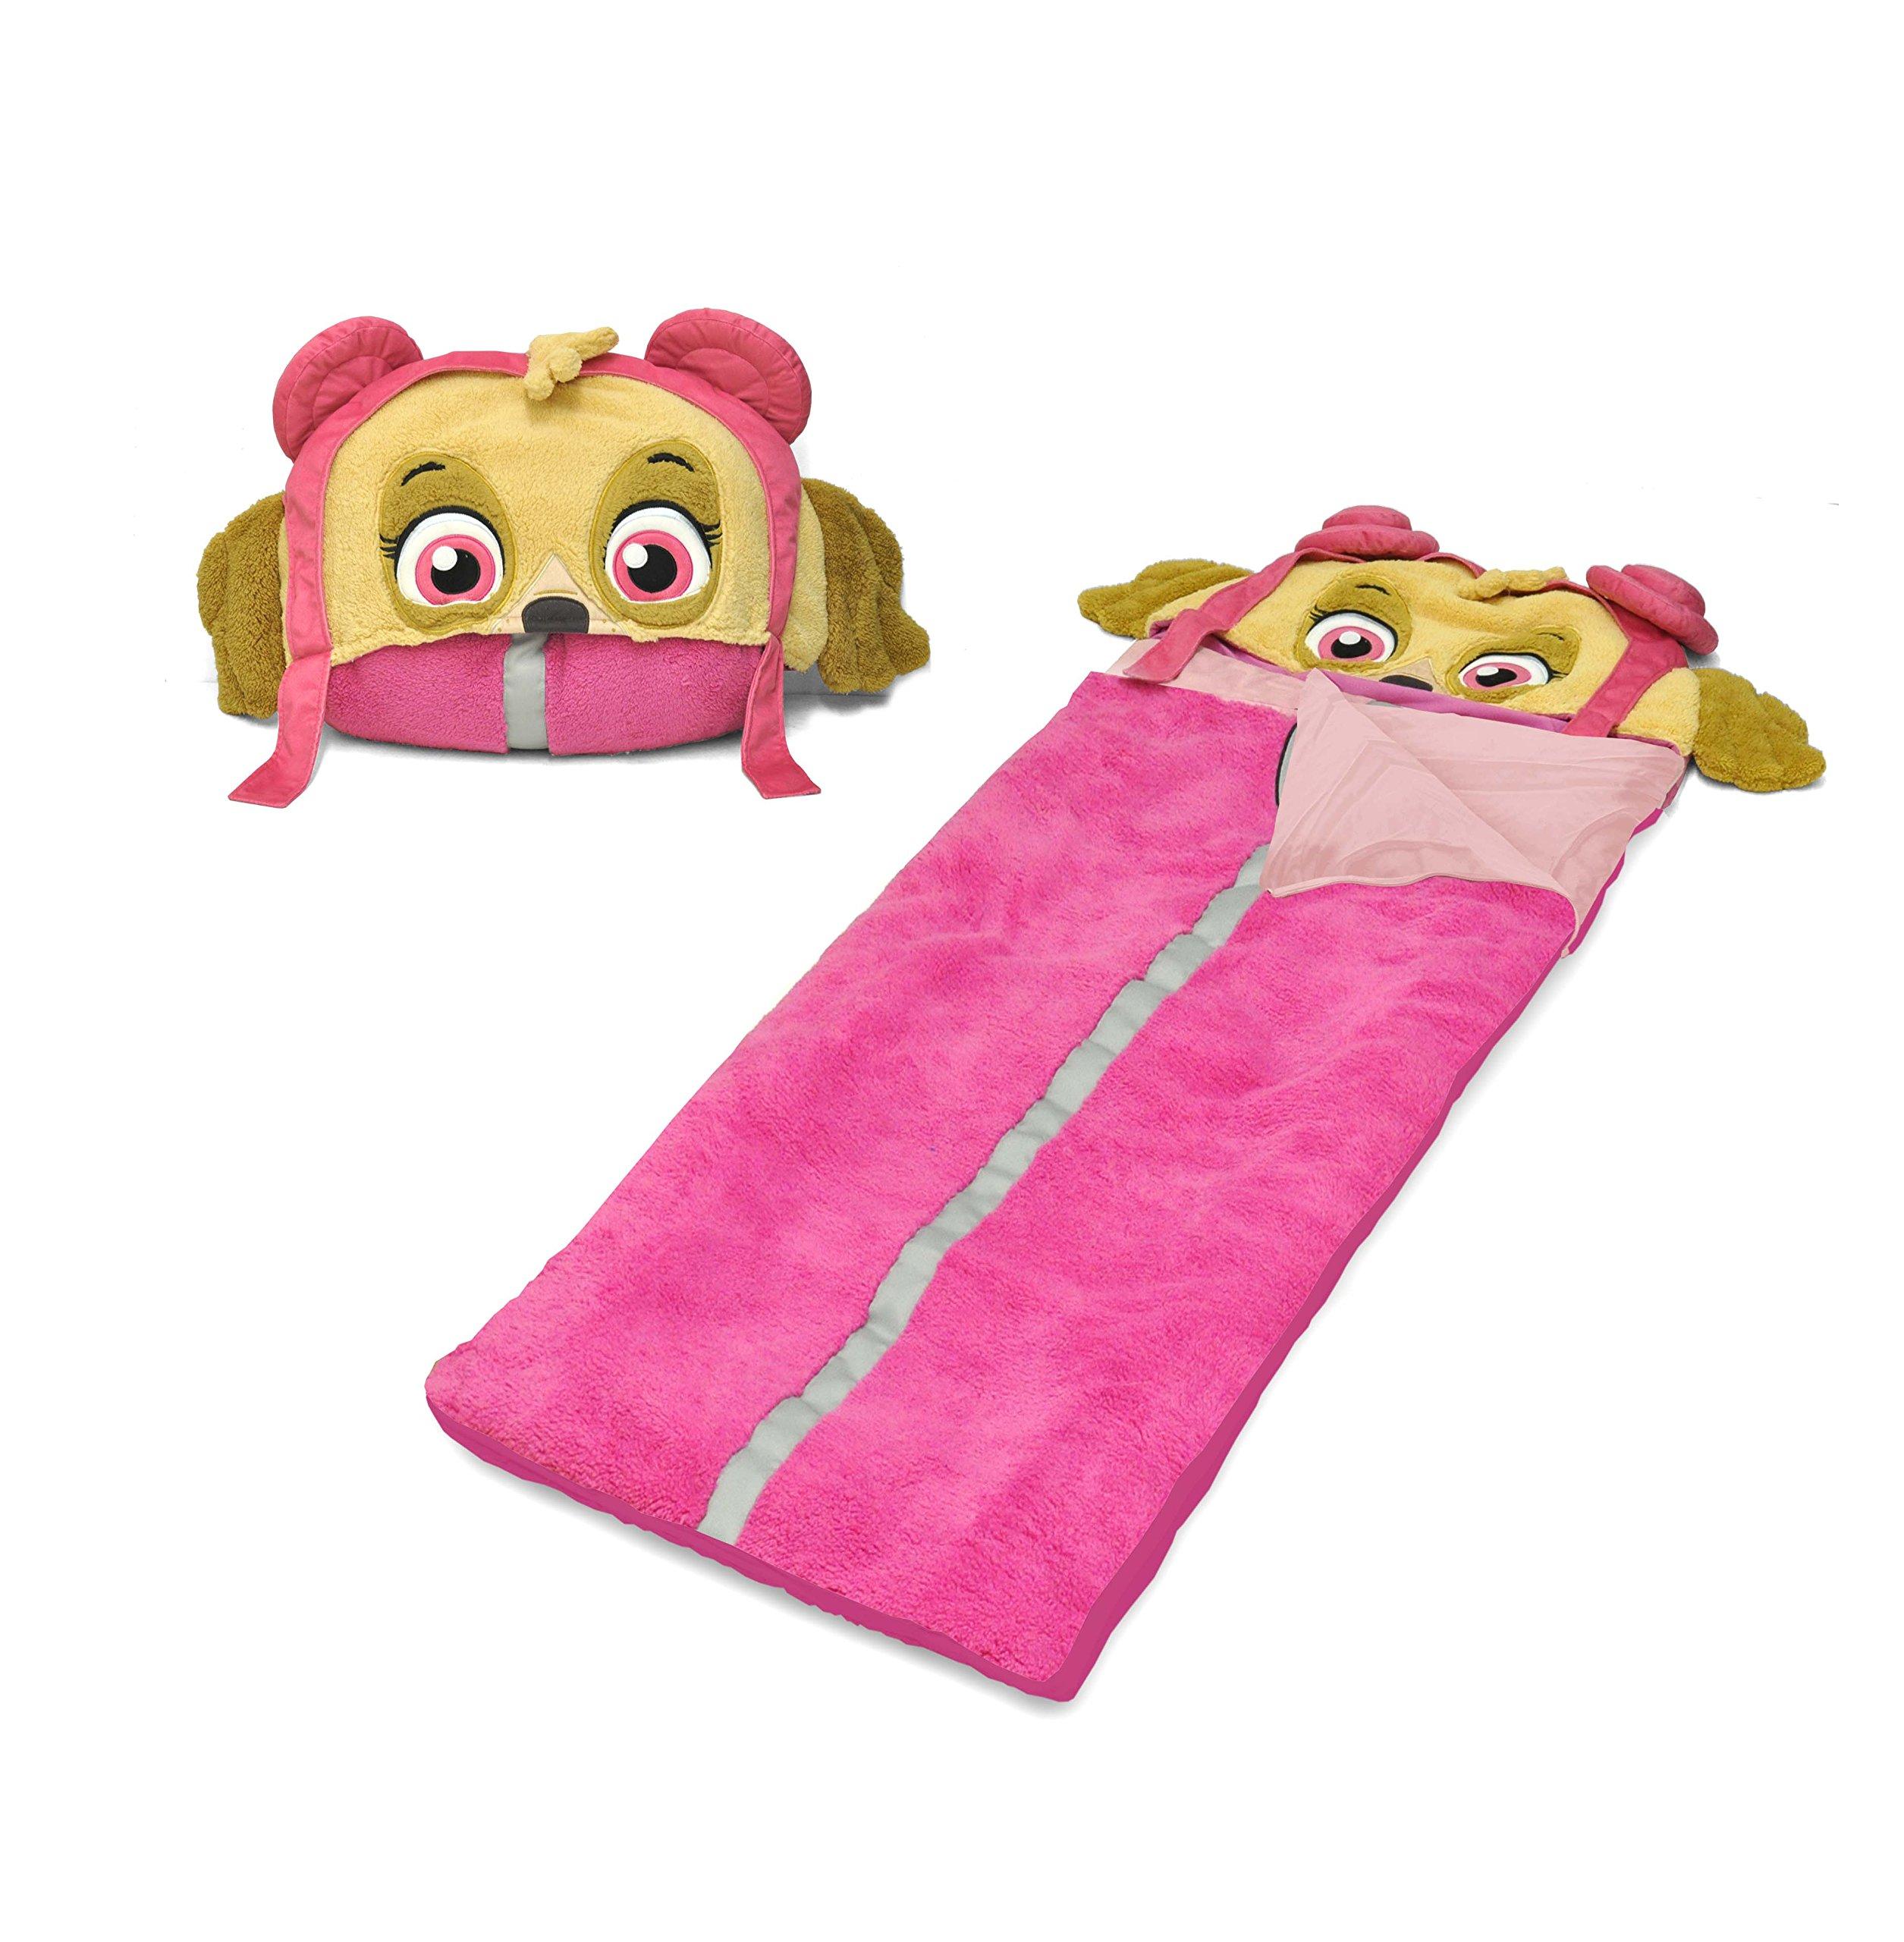 Nickelodeon Paw Patrol Skye Slumber Bag, Pink